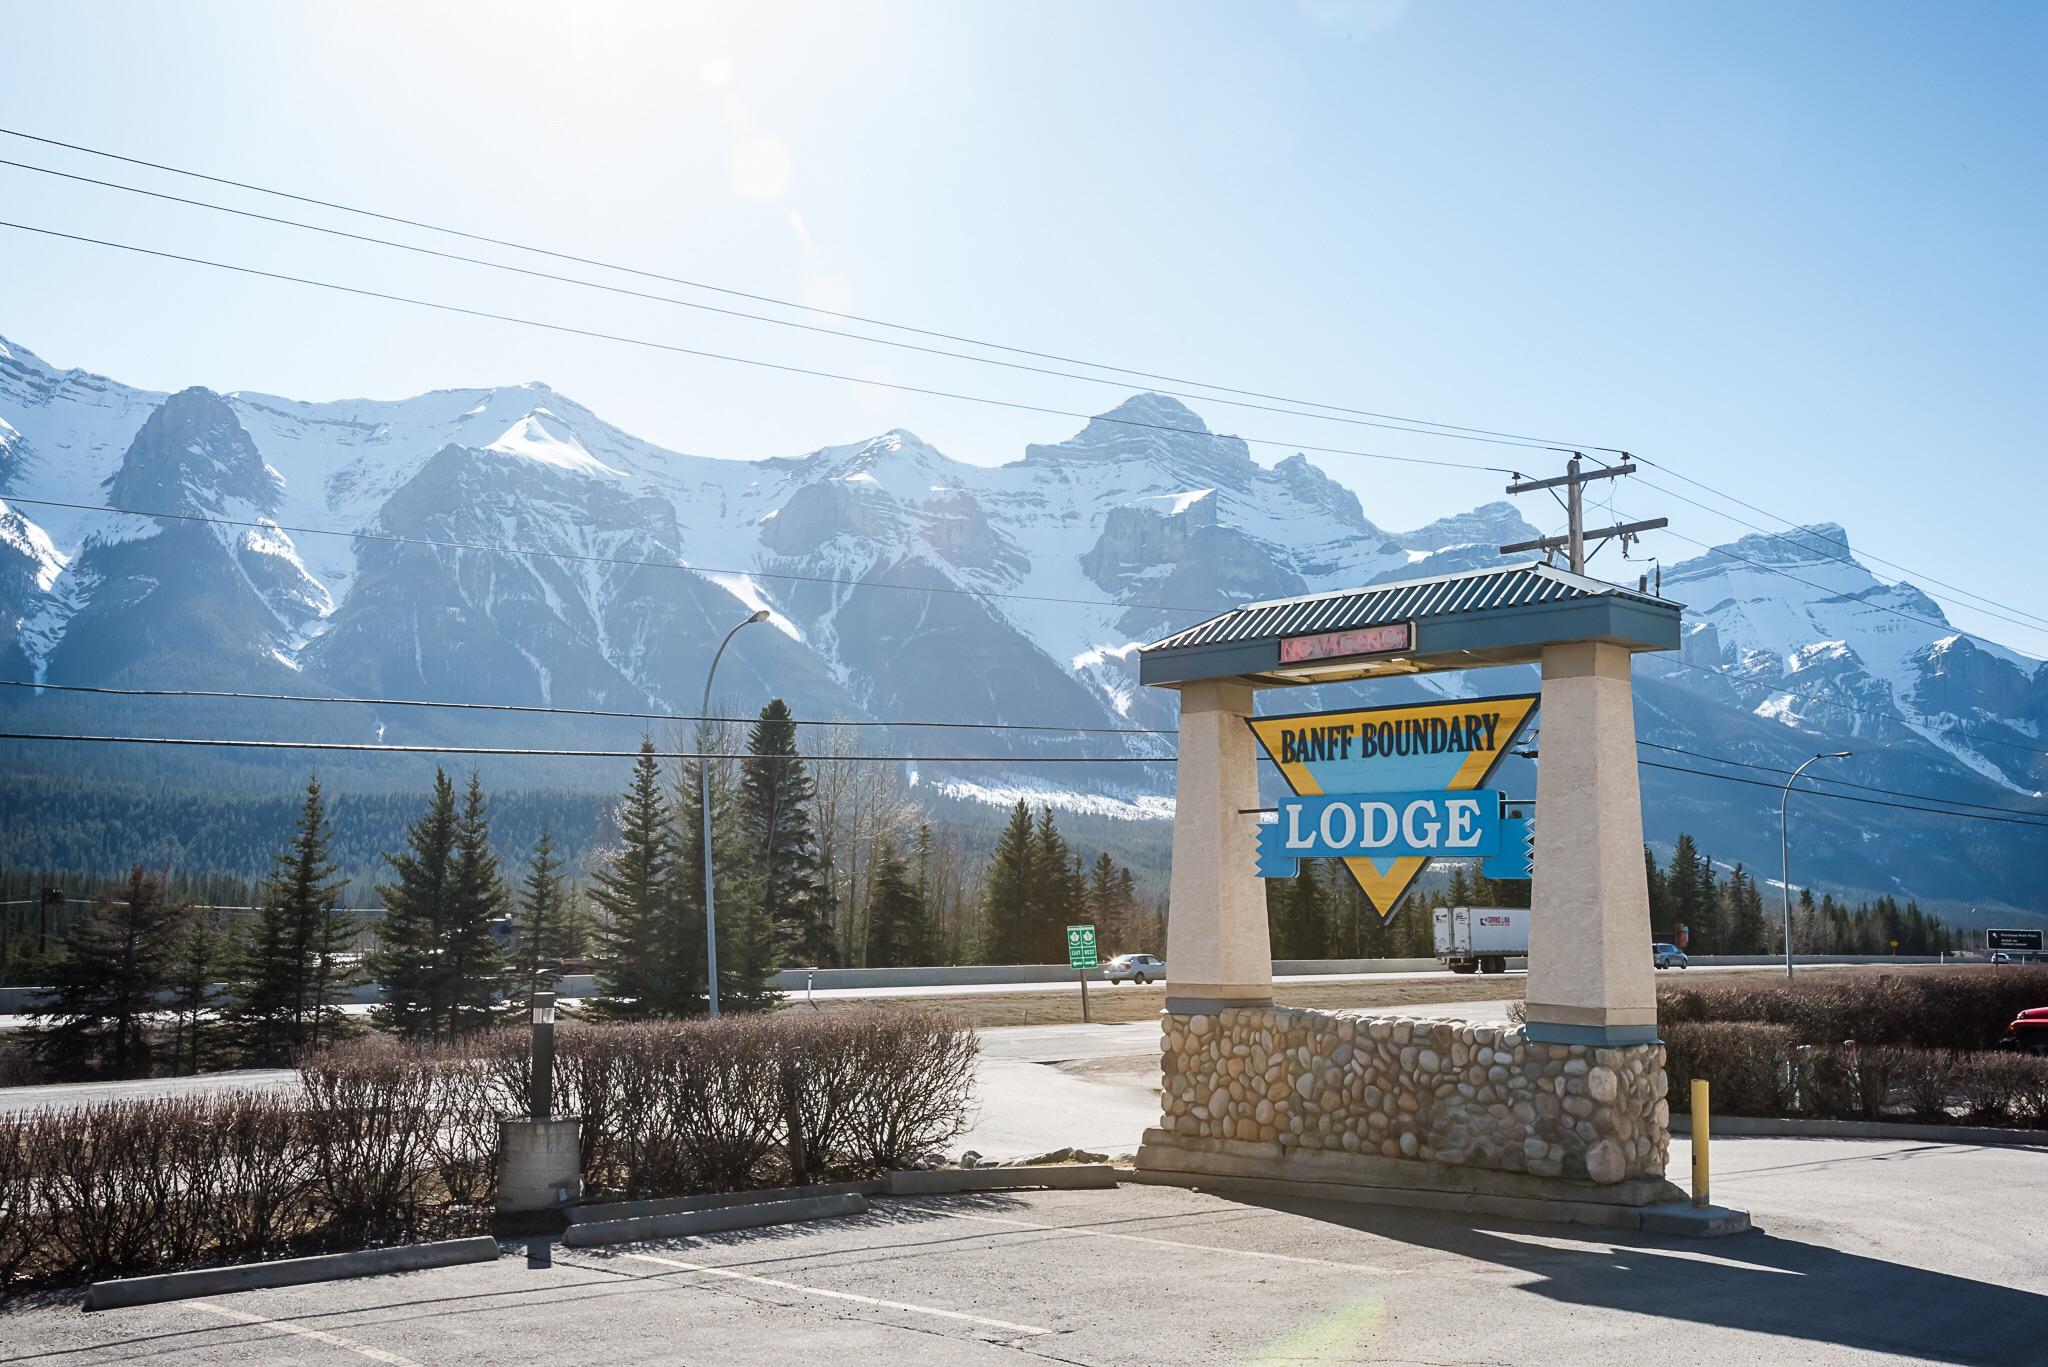 Scenic Banff Gate Two Bedroom Condo Loft Escape Apartments For Rent In Harvie Heights Alberta Canada